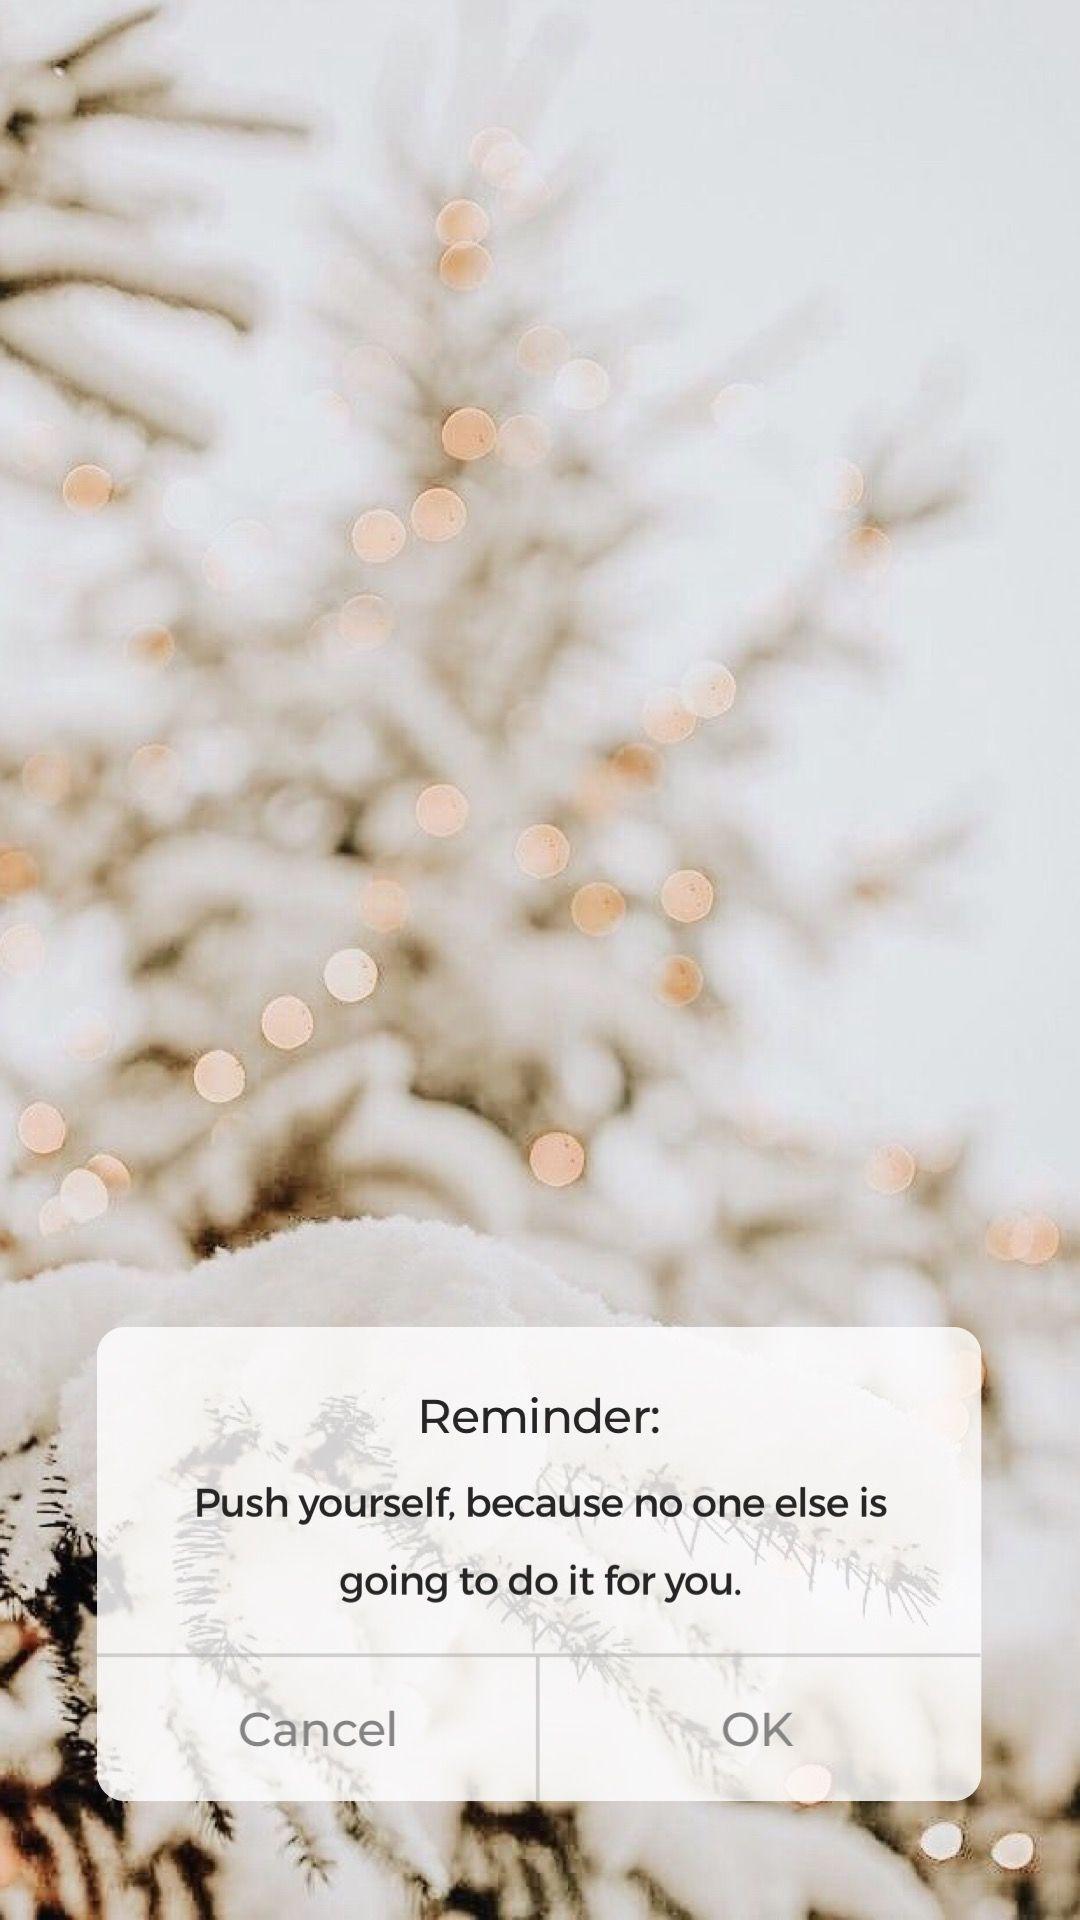 Motivational Reminder Pretty Phone Wallpaper Iphone Reminders Lock Screen Wallpaper Iphone